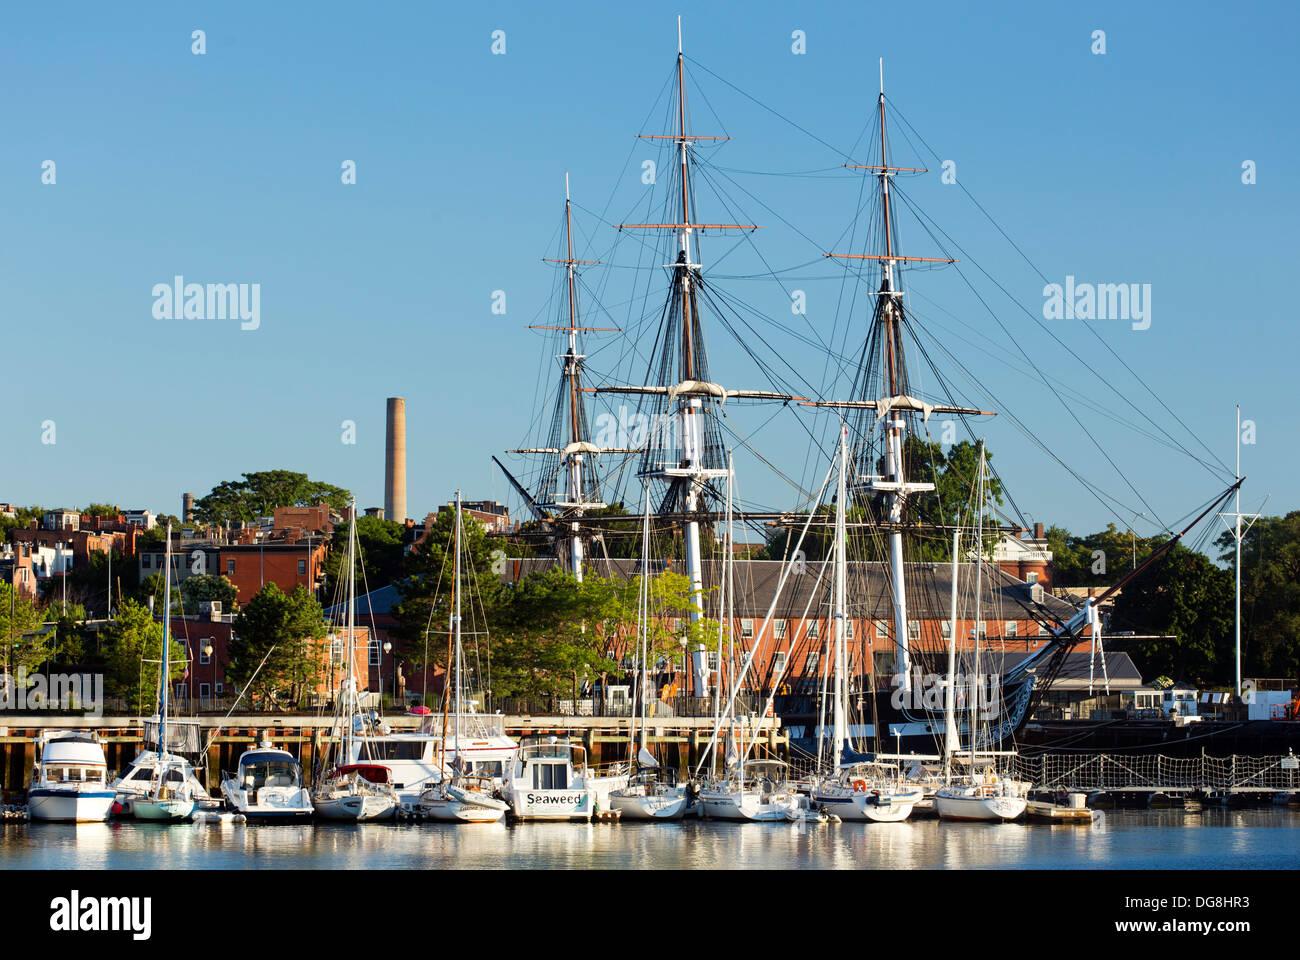 USS Constitution ('Old Ironsides'), el Astillero Naval de Charlestown, Parque Nacional Histórico de Boston, Boston, Massachusetts, EE.UU. Imagen De Stock